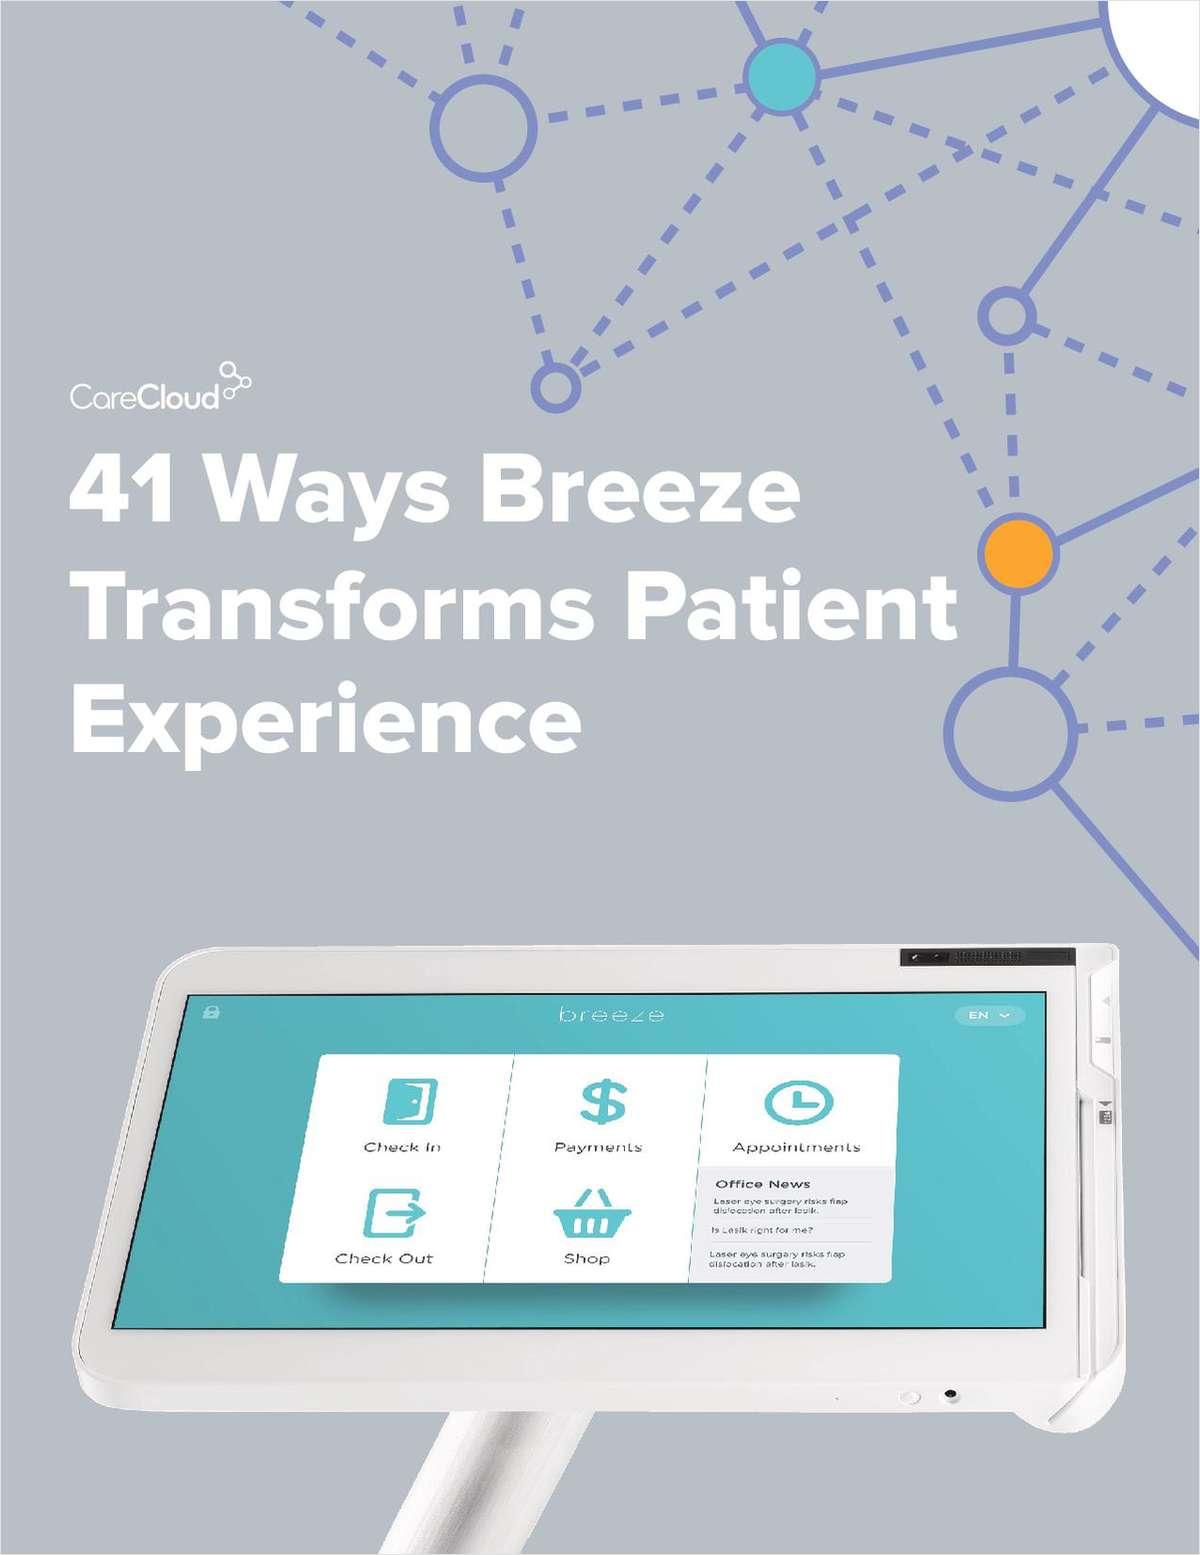 41 Ways Breeze Transforms Patient Experience